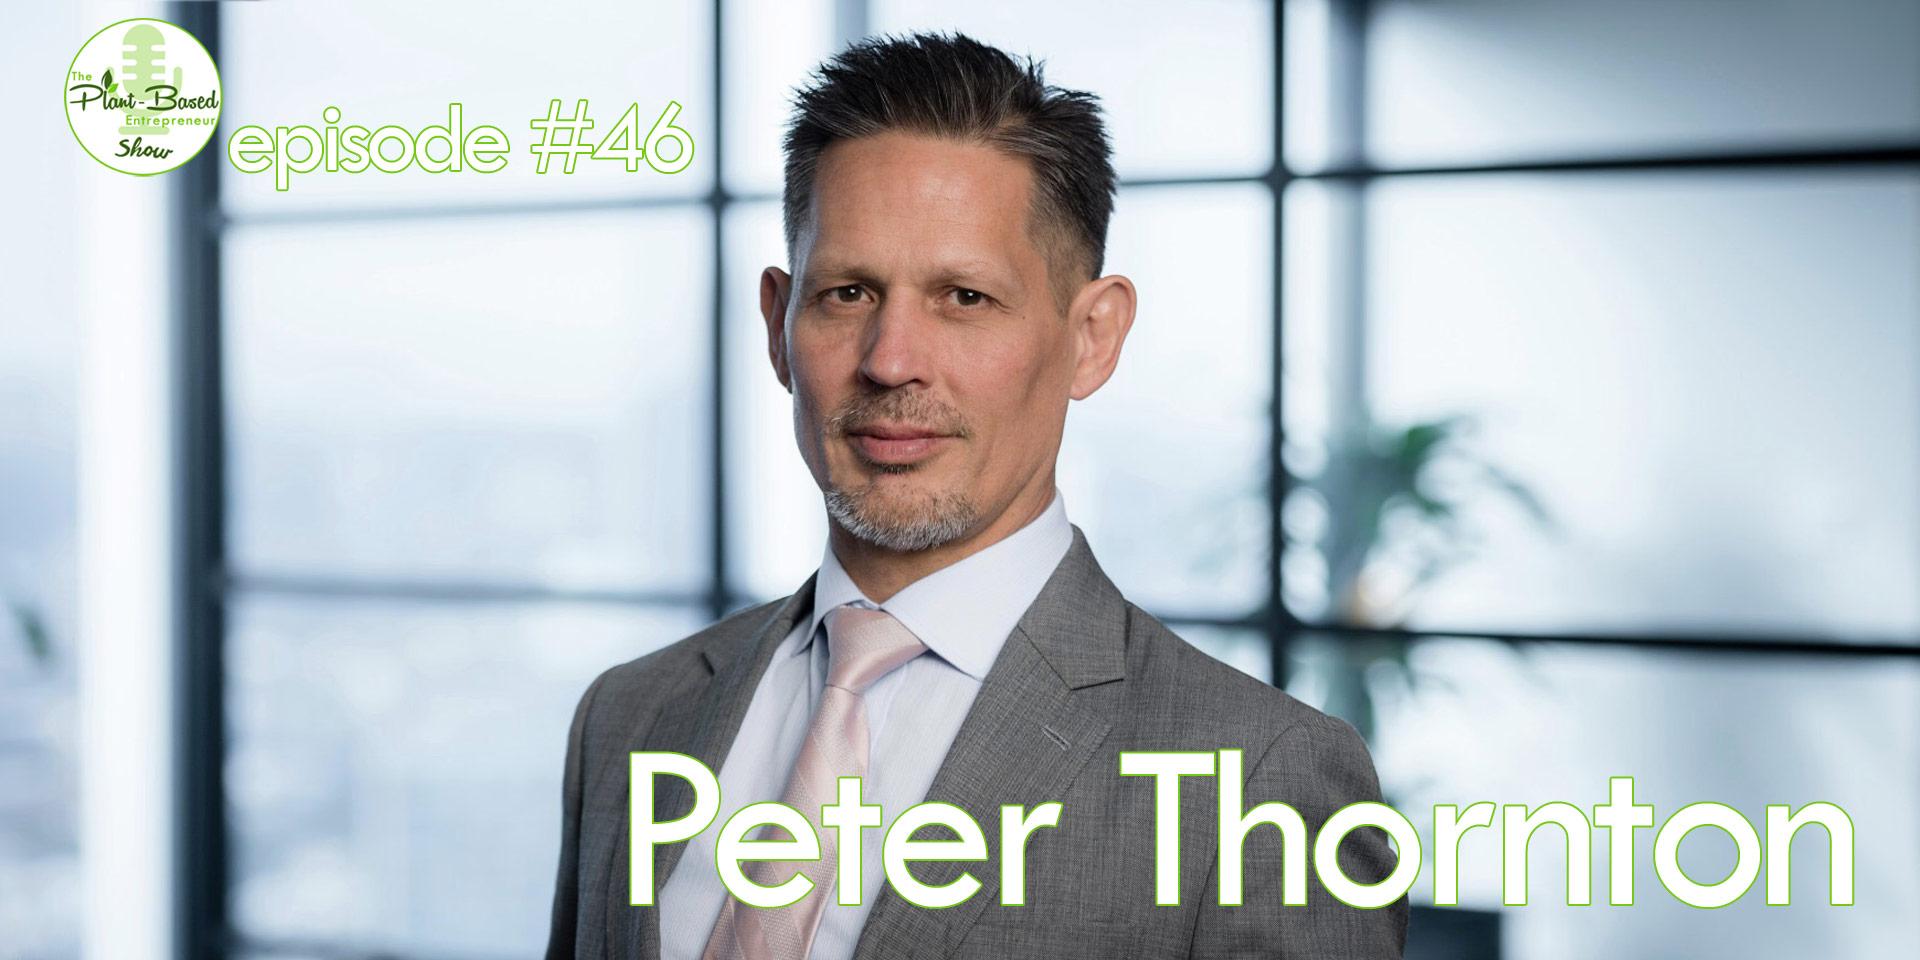 Episode #46 - Peter Thornton